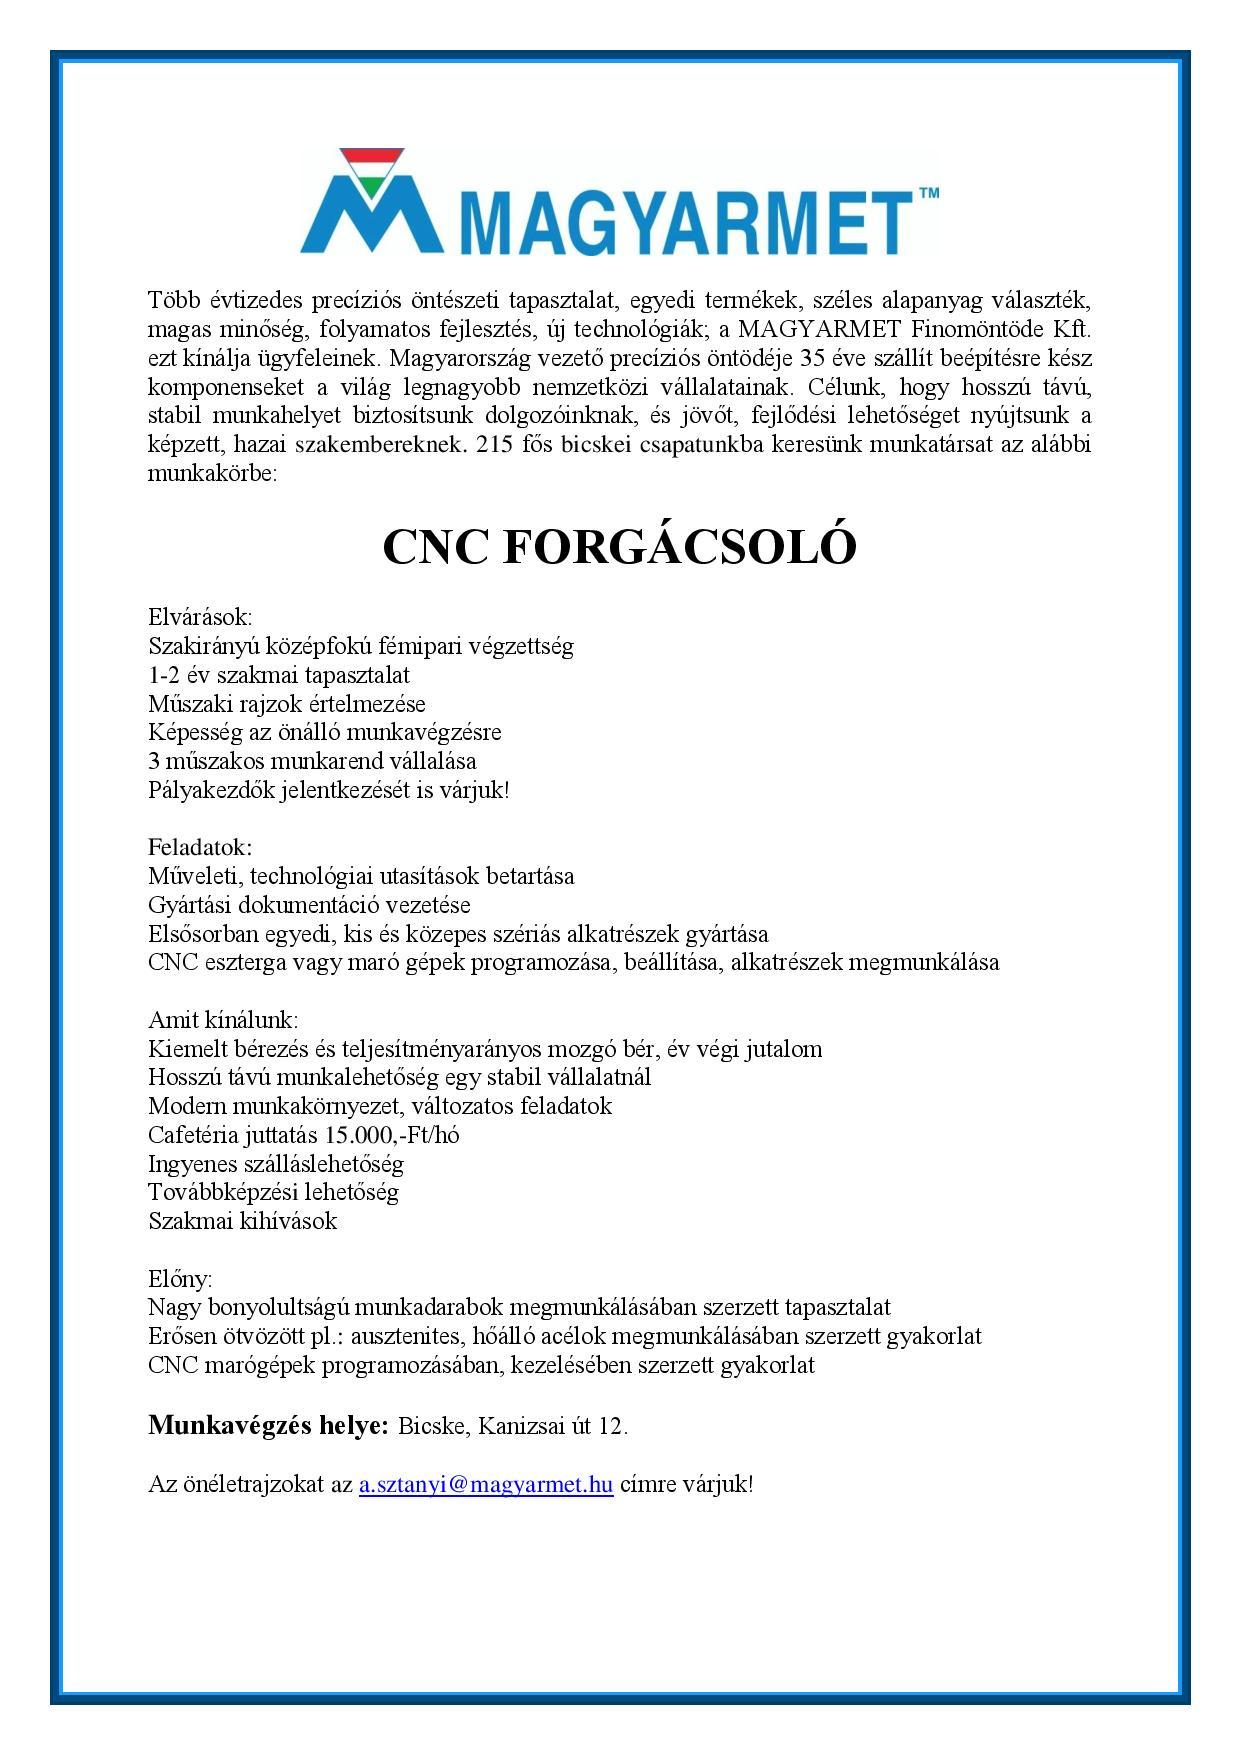 cnc_forgacsolo_keretes-page-001.jpg